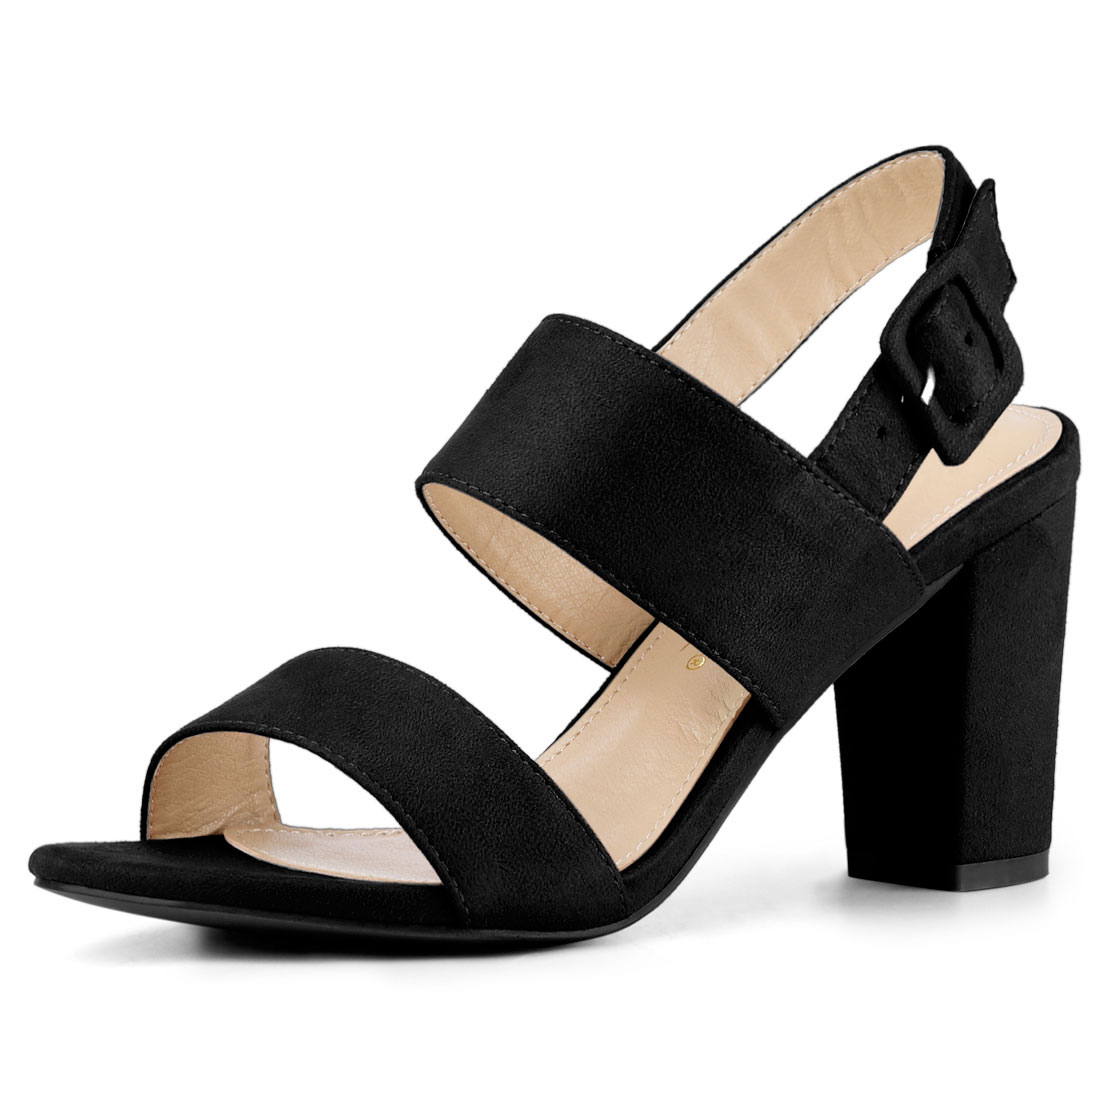 Women Open Toe Slingback High Block Heel Sandals Black US 7